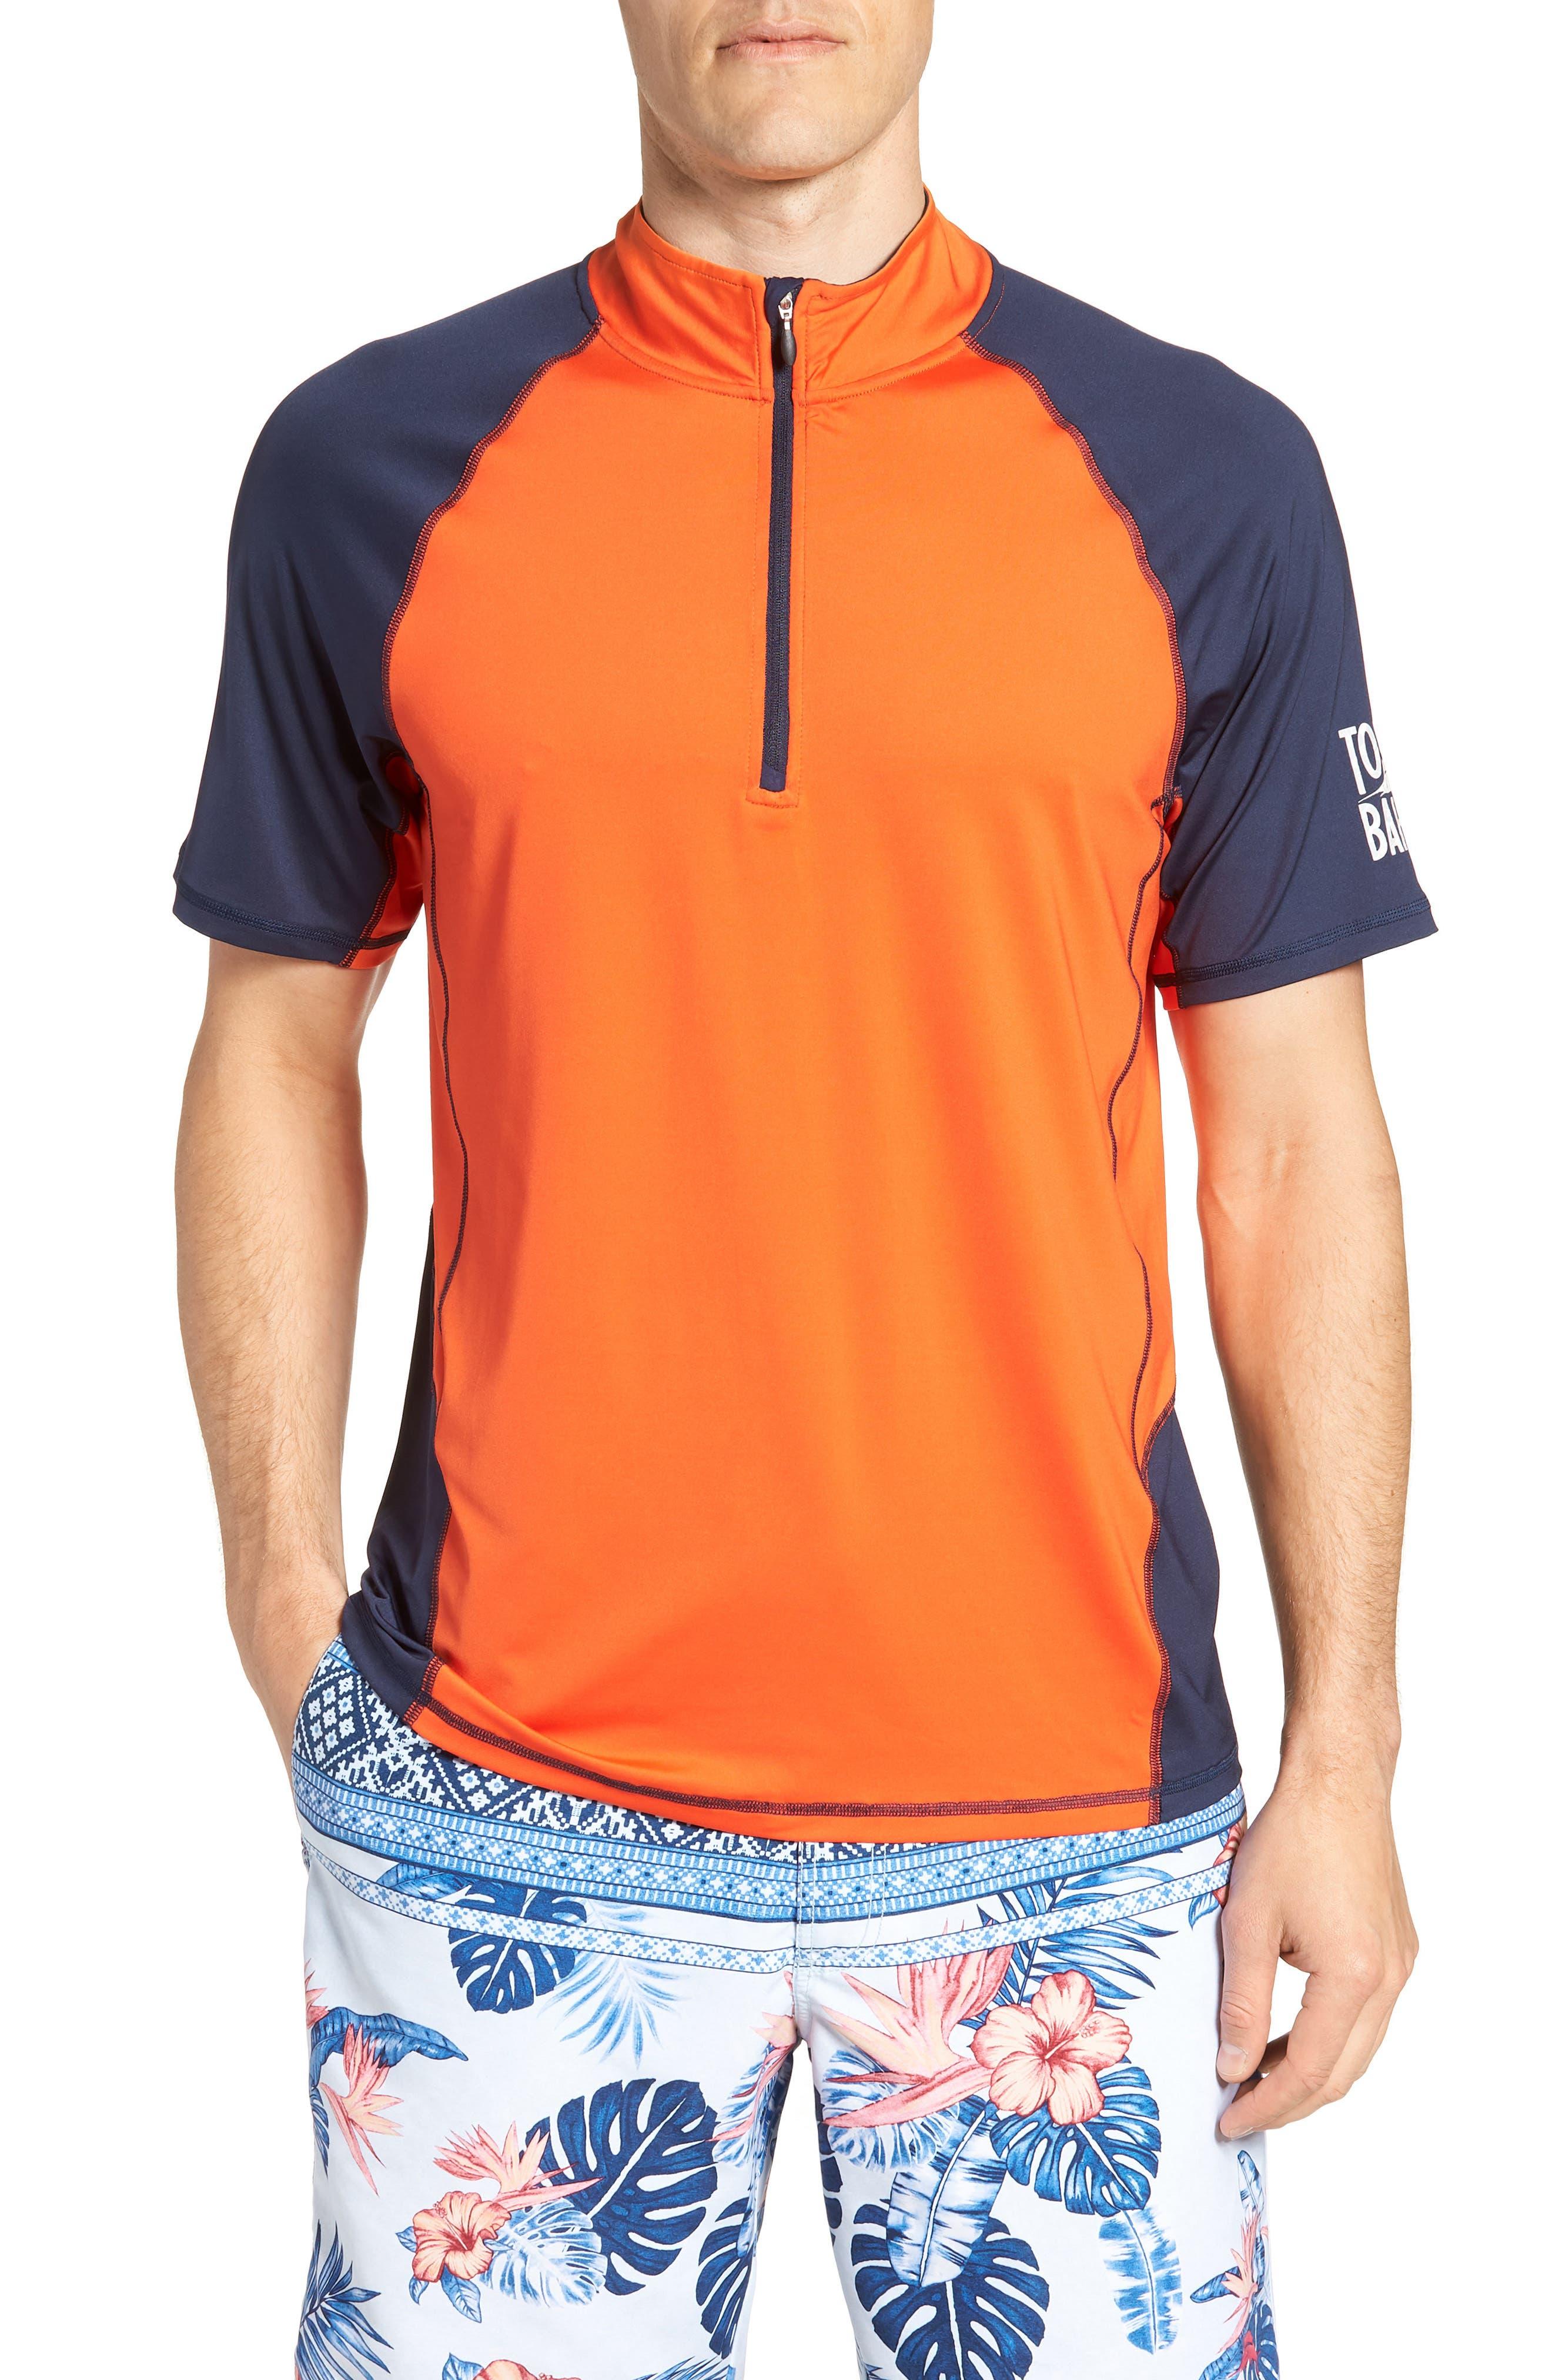 Tommy Bahama IslandActive™ Colorblock Beach Pro Rashguard T-Shirt